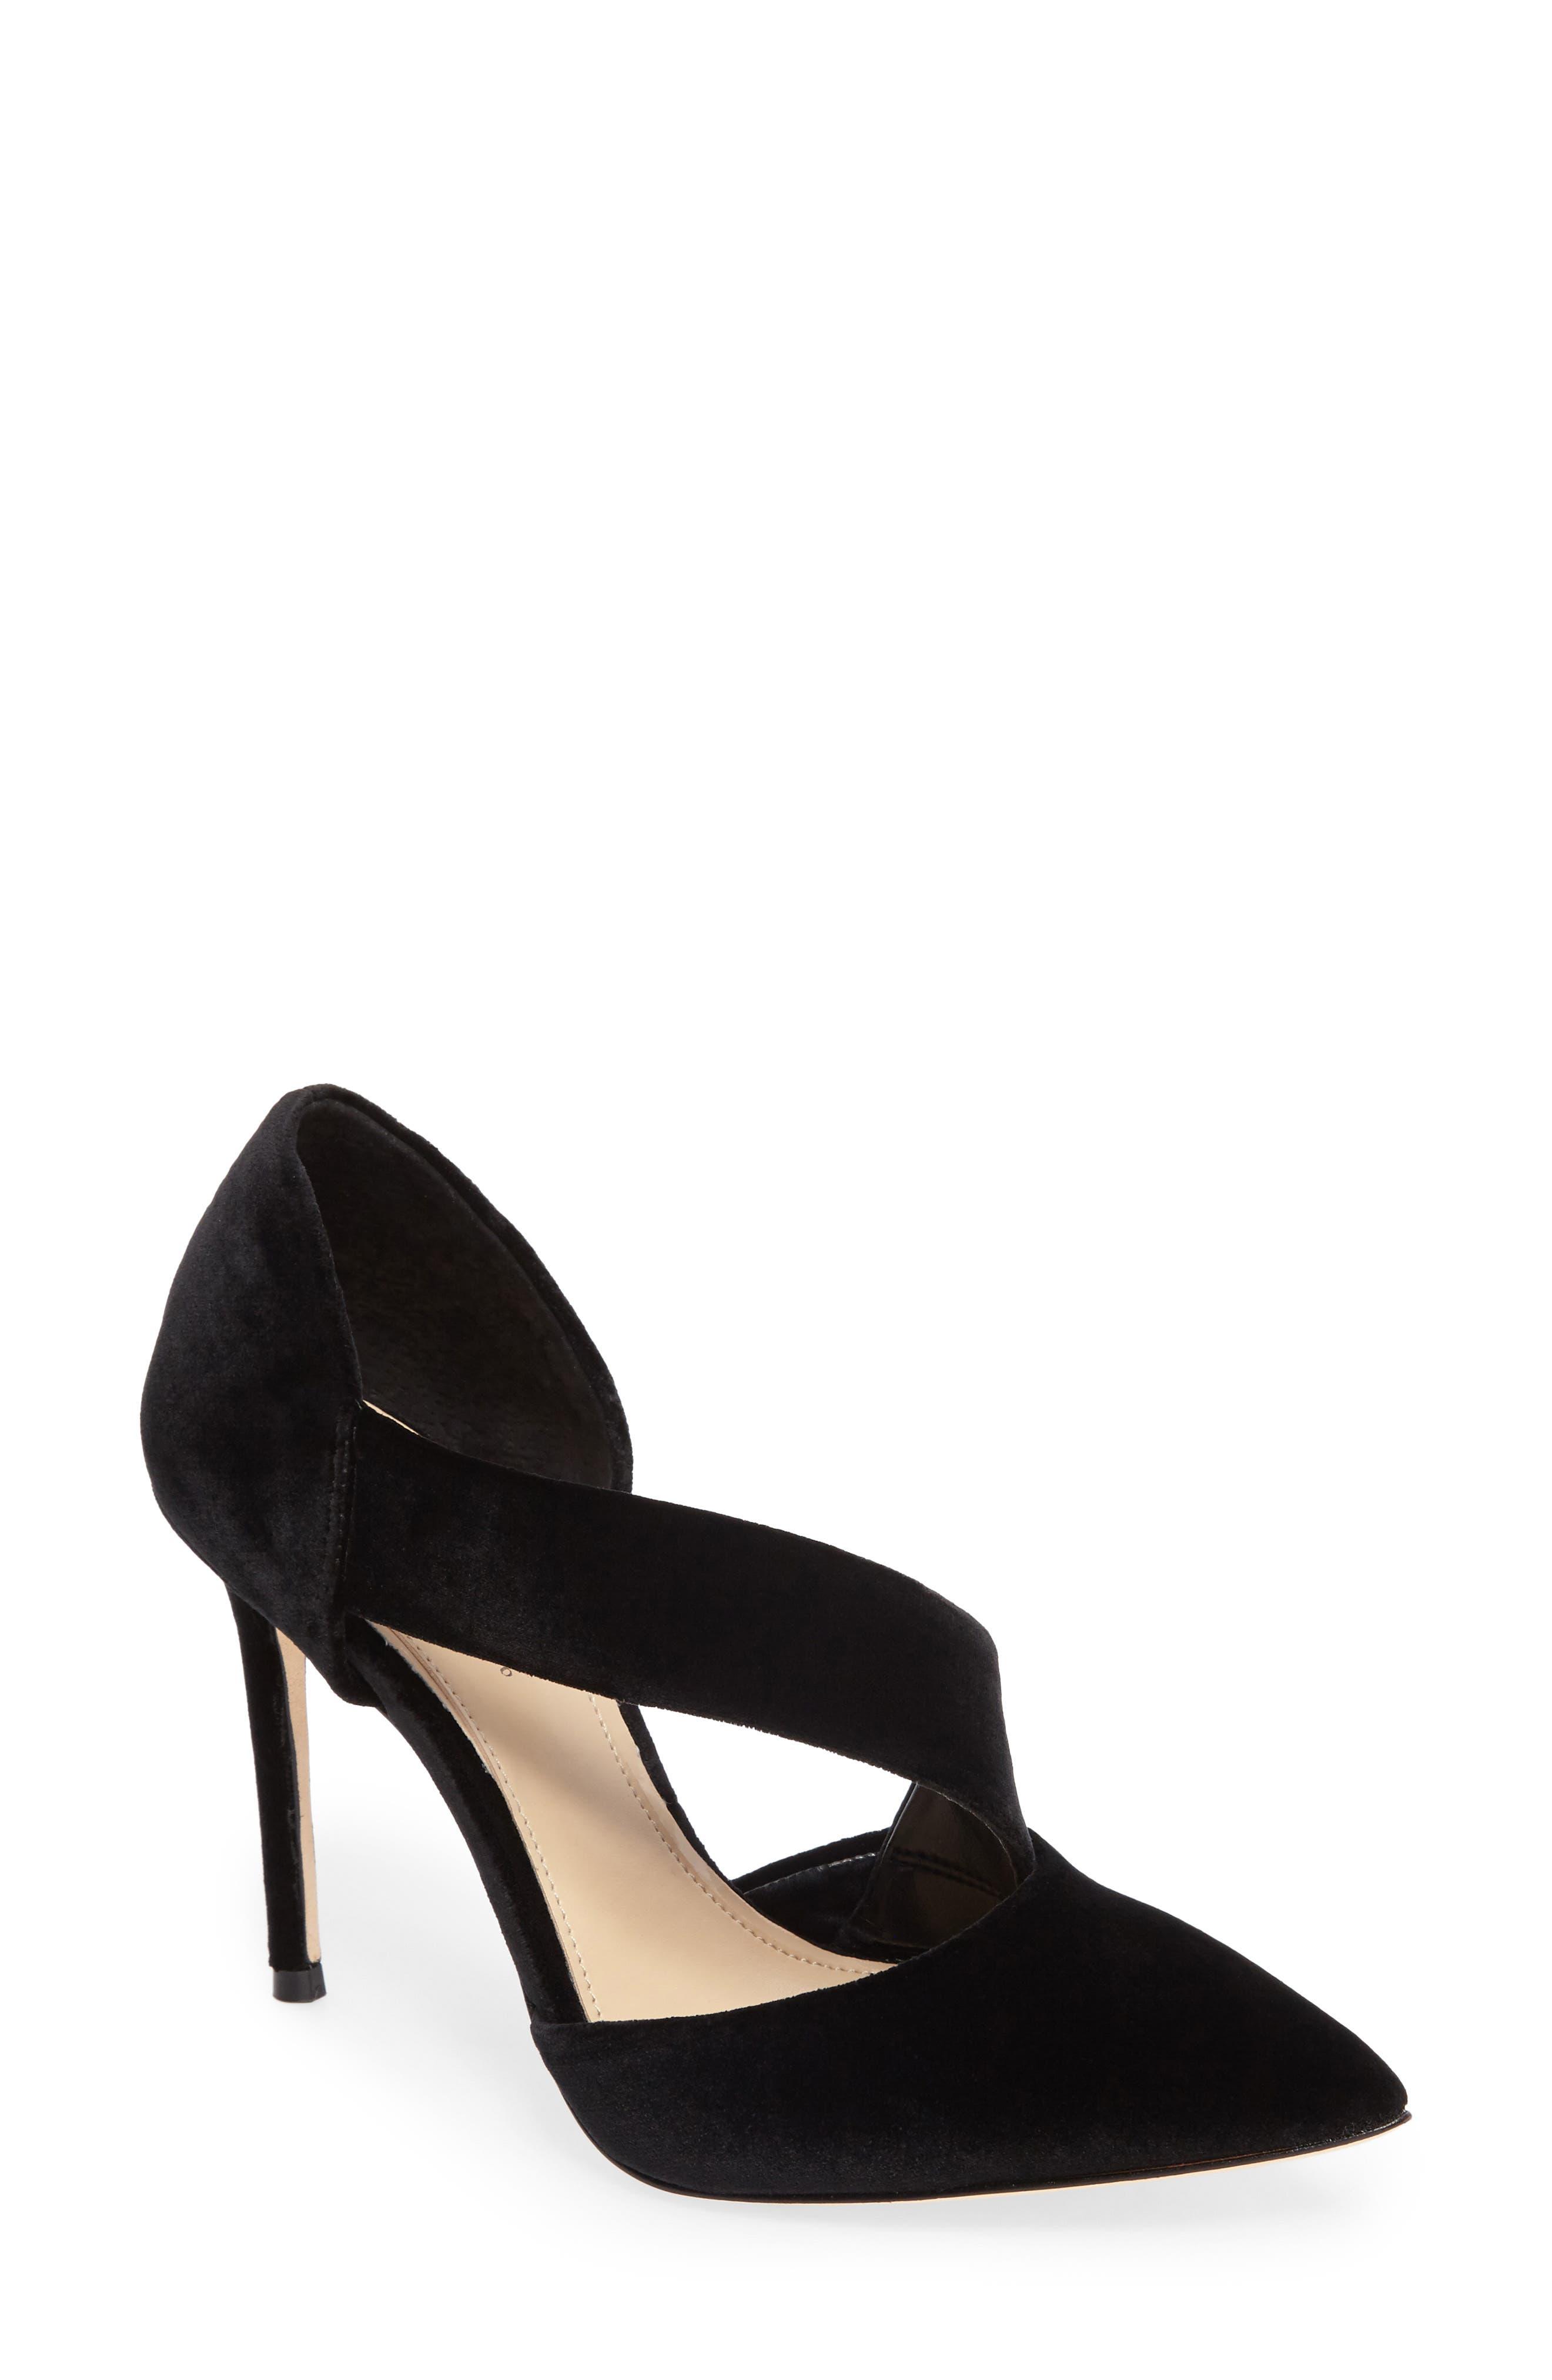 Oya Asymmetrical Pointy Toe Pump,                         Main,                         color, Black Velvet